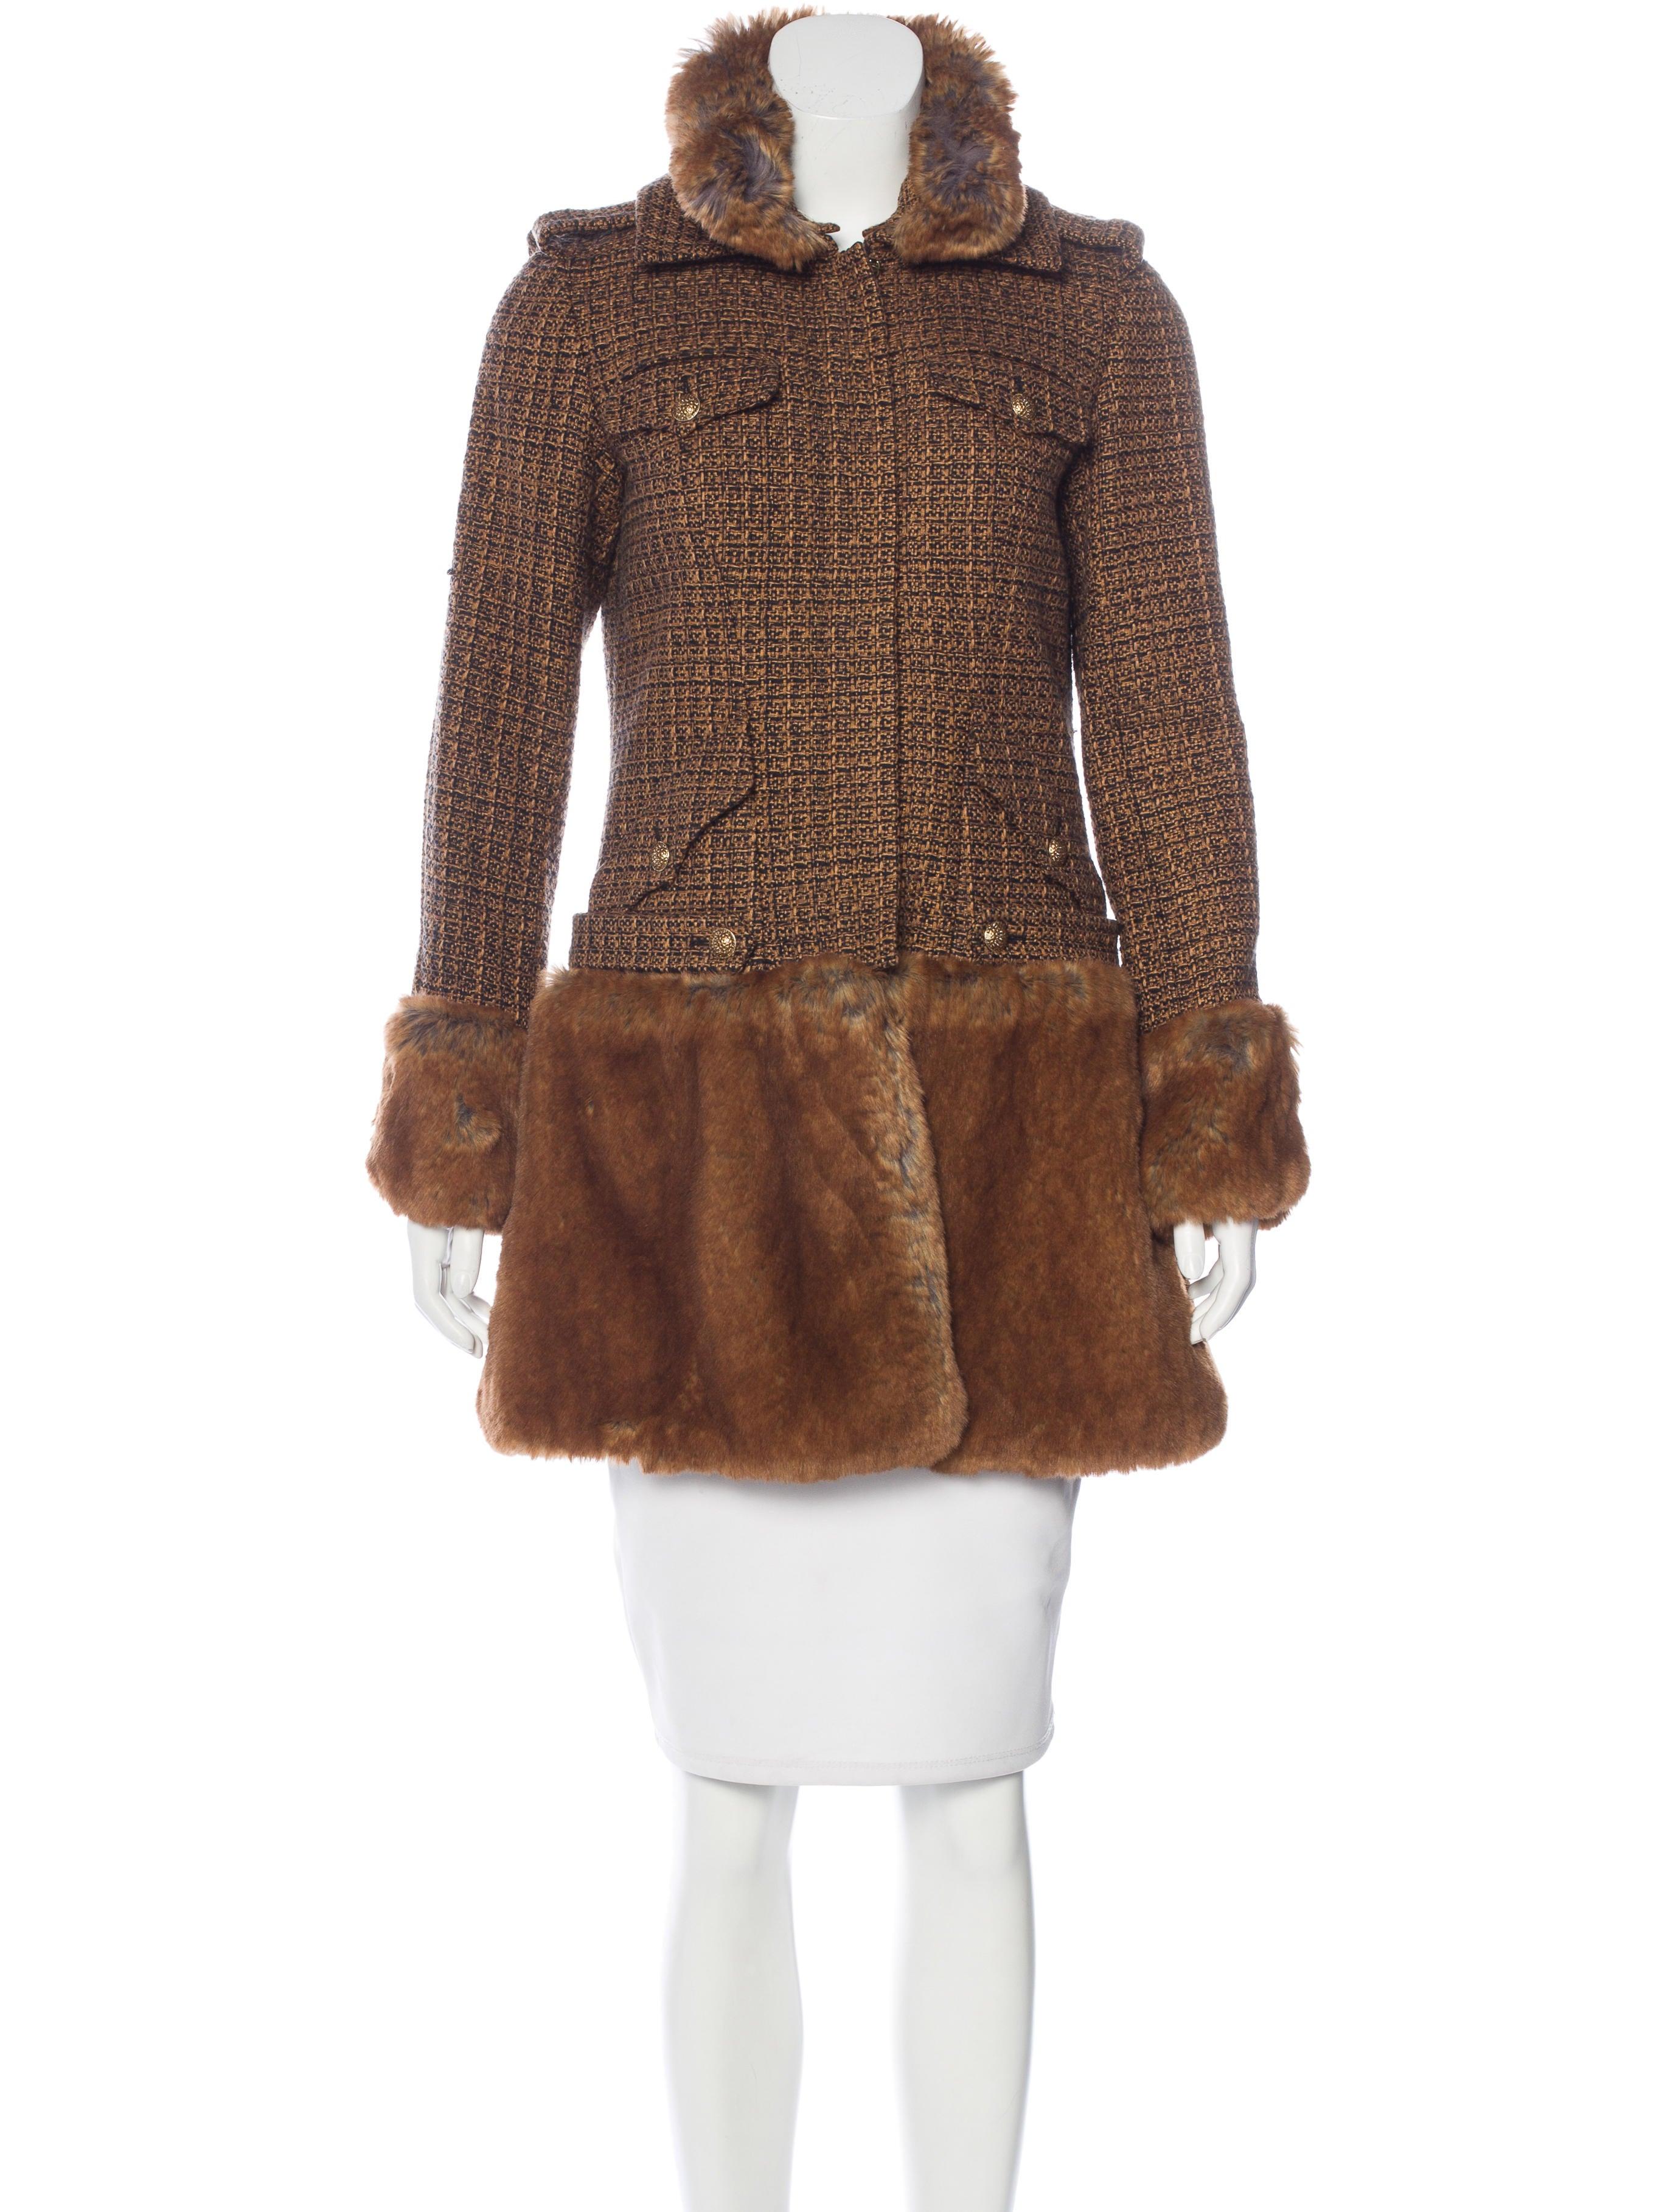 Chanel Tweed Fantasy Fur Coat Clothing Cha157692 The